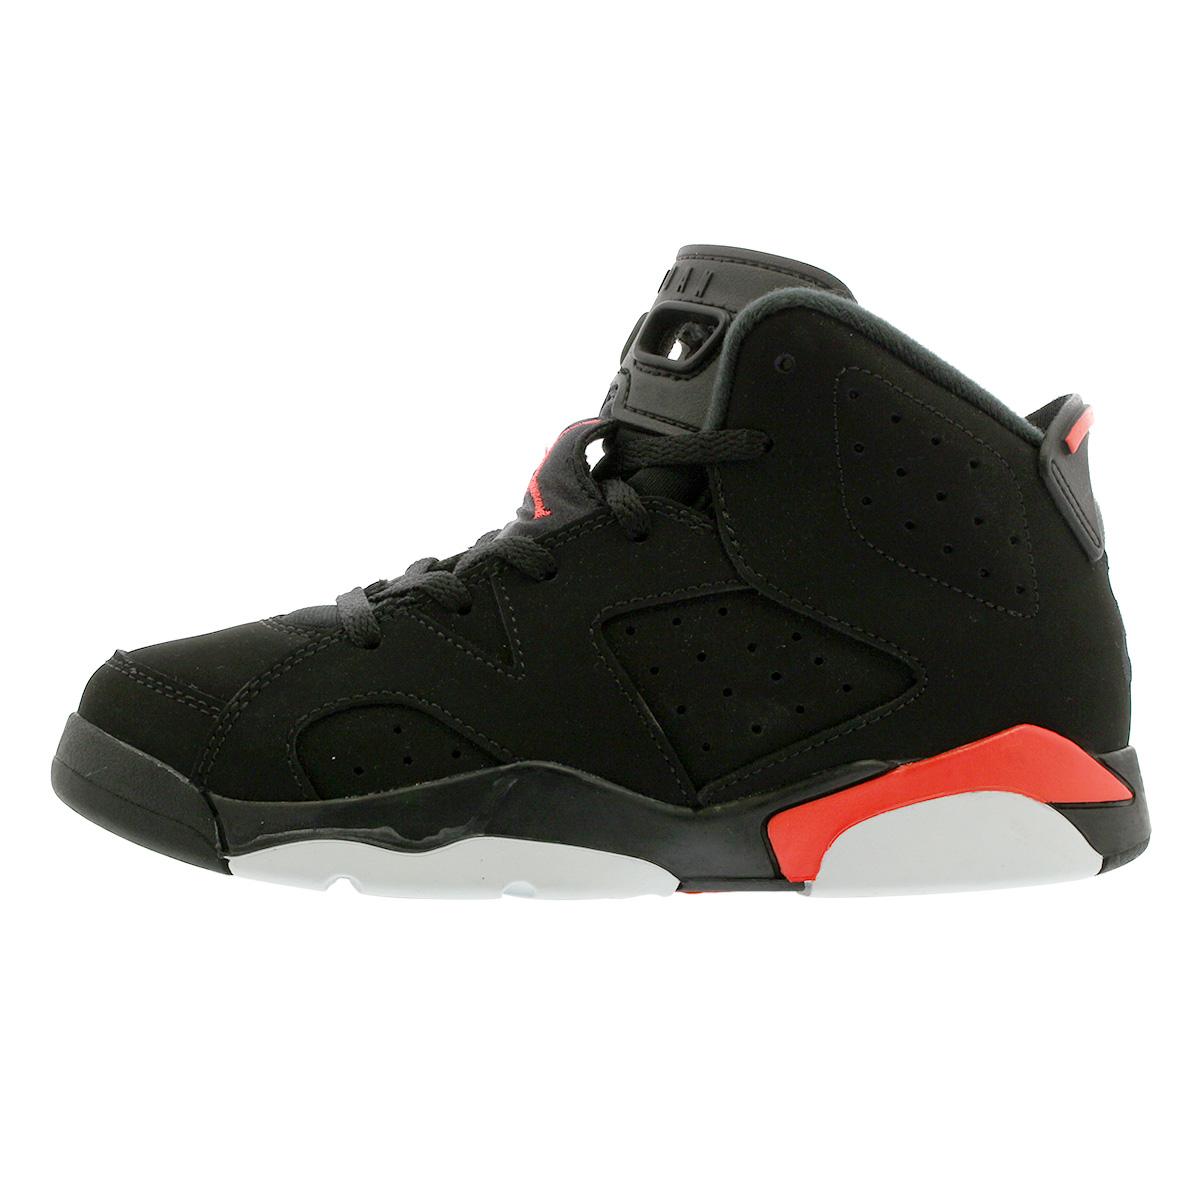 64e59d0c2ce ... NIKE AIR JORDAN 6 RETRO BP Nike Air Jordan 6 nostalgic BP BLACK/INFRARED  384,666 ...